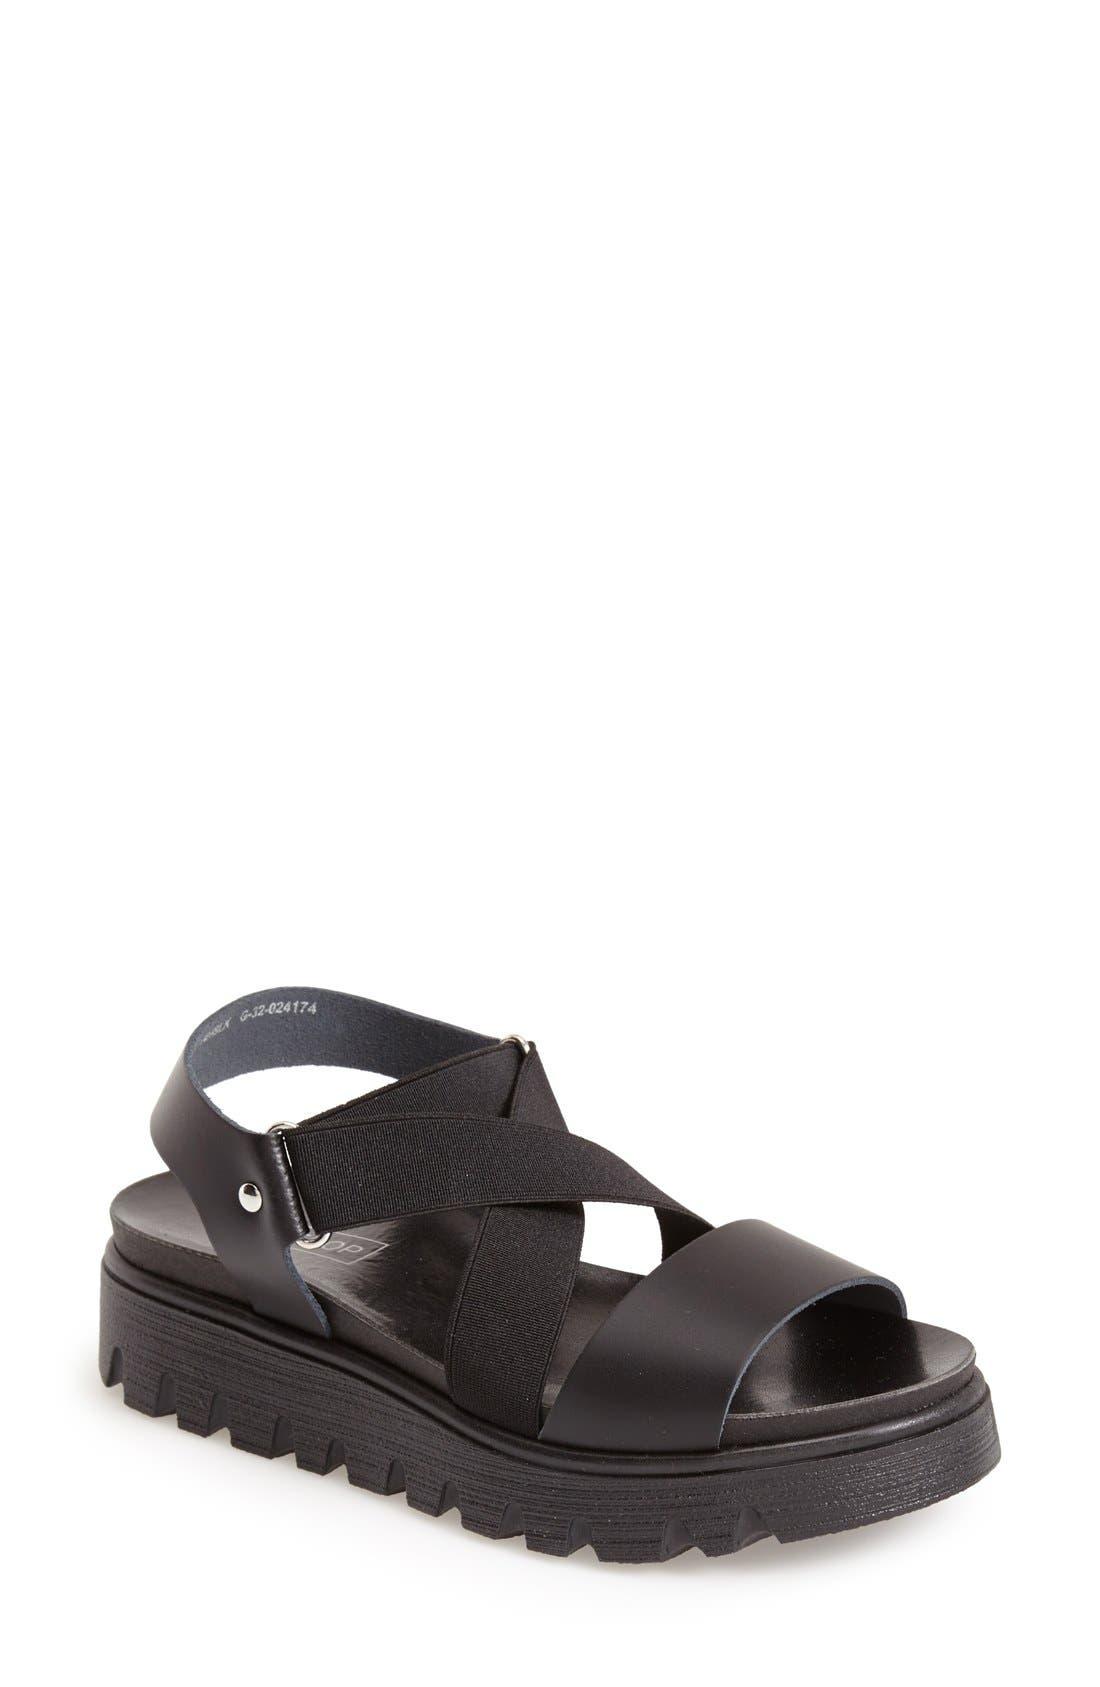 Alternate Image 1 Selected - Topshop 'Folly' Strappy Platform Sandal (Women)